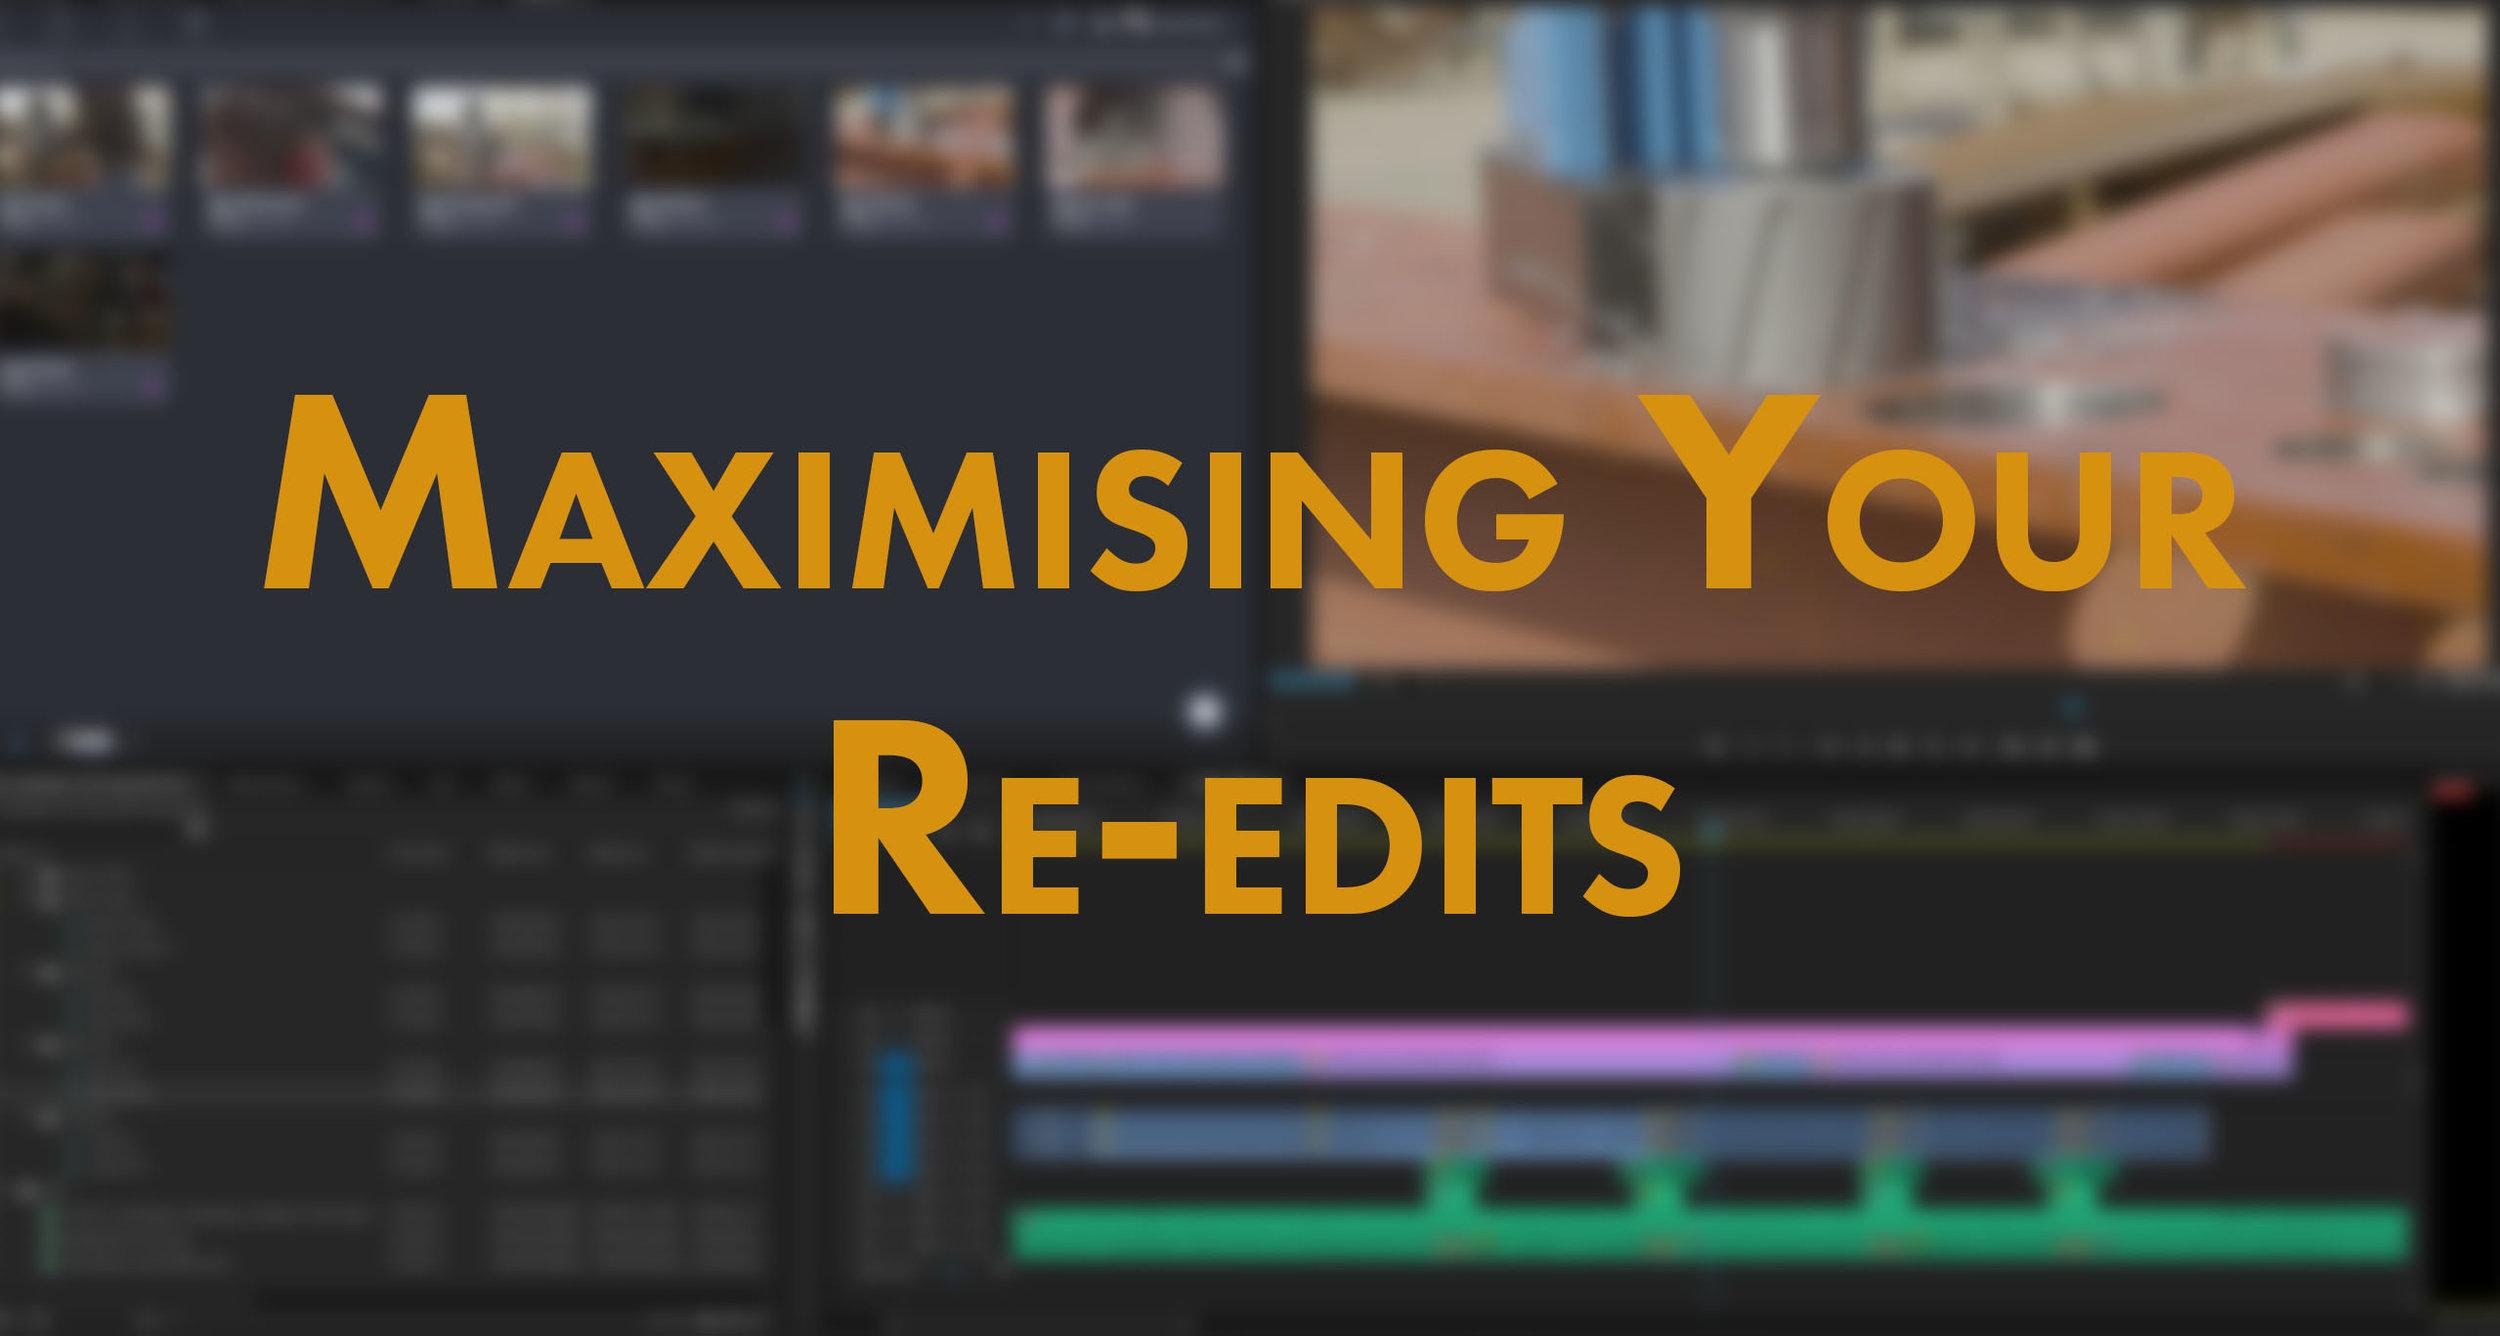 Re-edits thumbnail.jpg